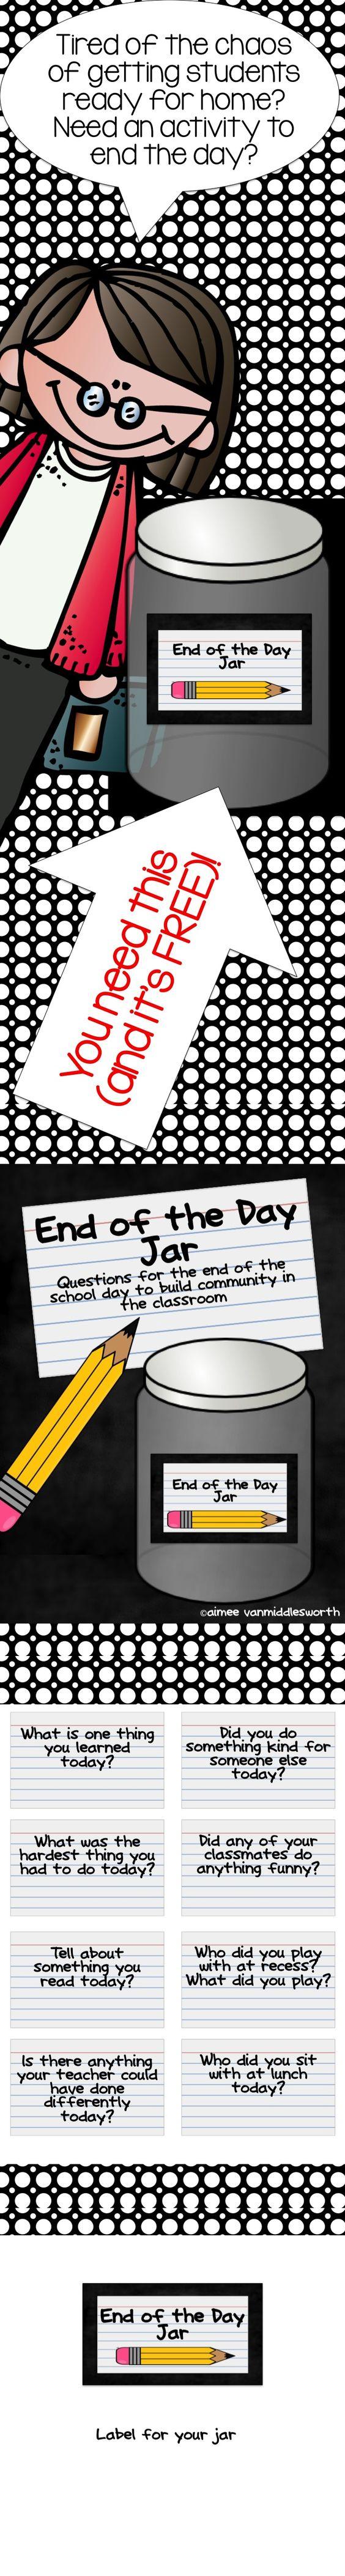 Classroom Jar Ideas : The end of day jar free classroom ideas